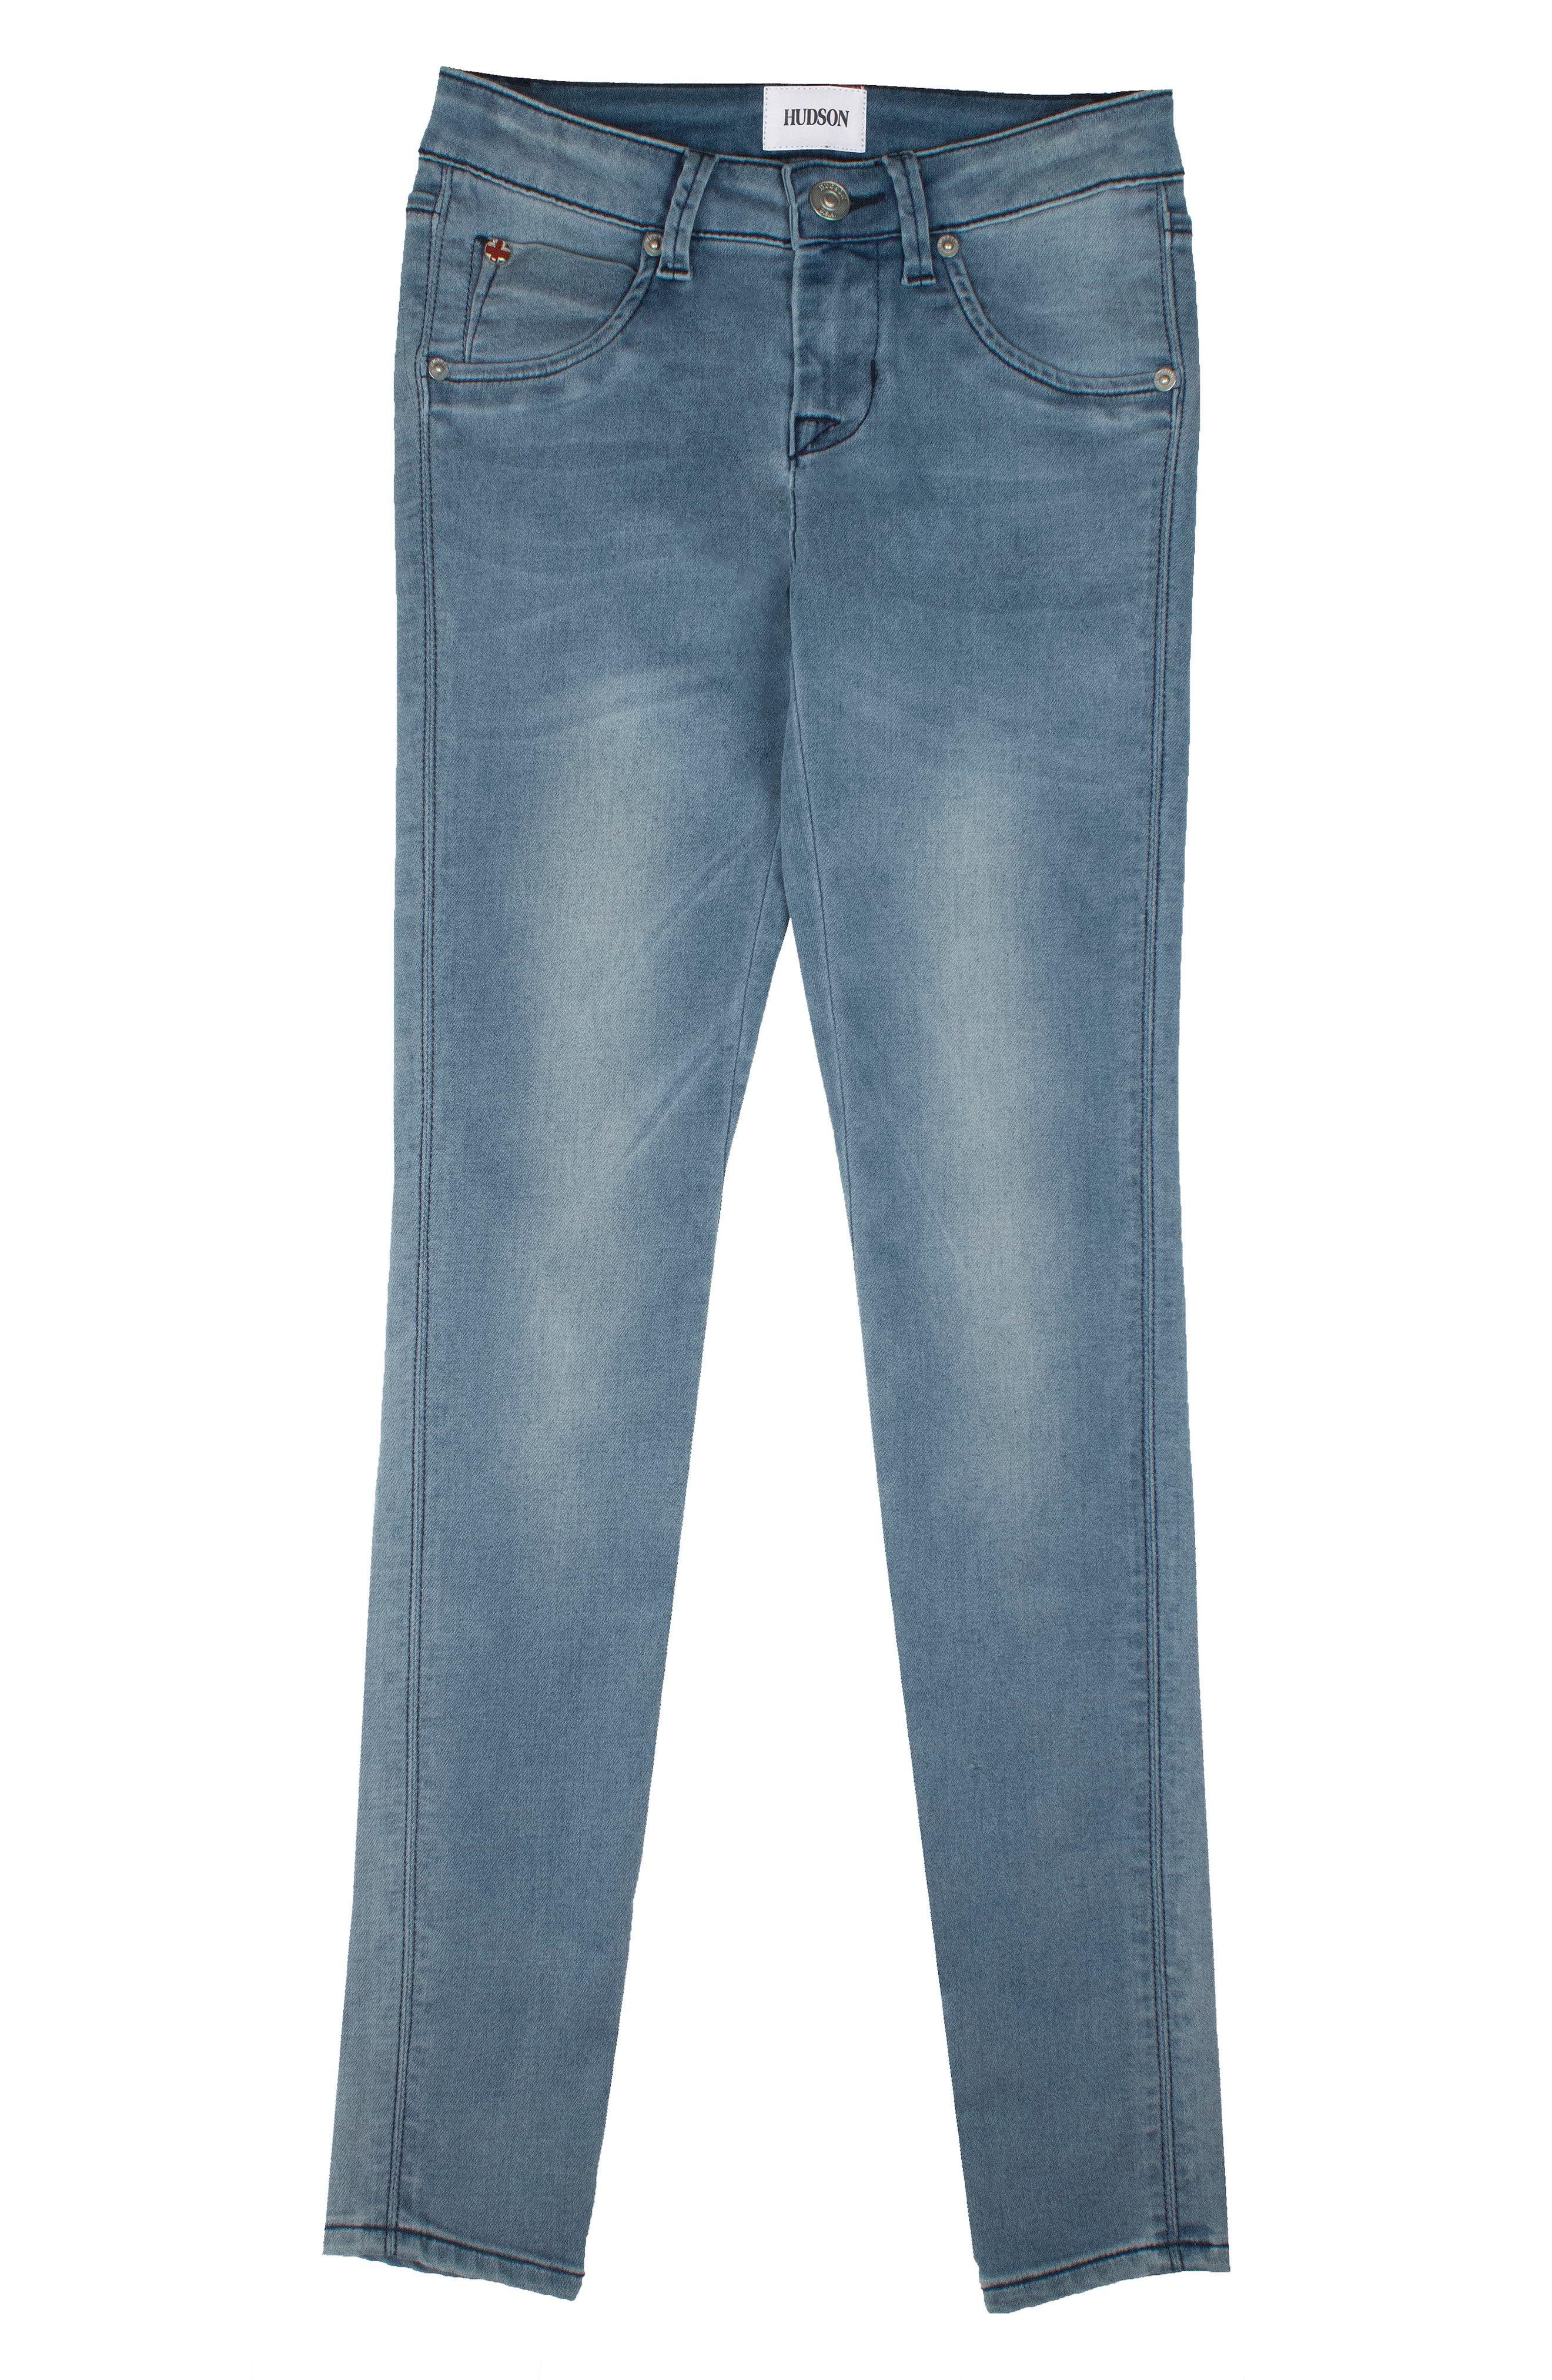 Alternate Image 1 Selected - Hudson Kids Collin Flap Pocket Skinny Jeans (Toddler Girls & Little Girls)